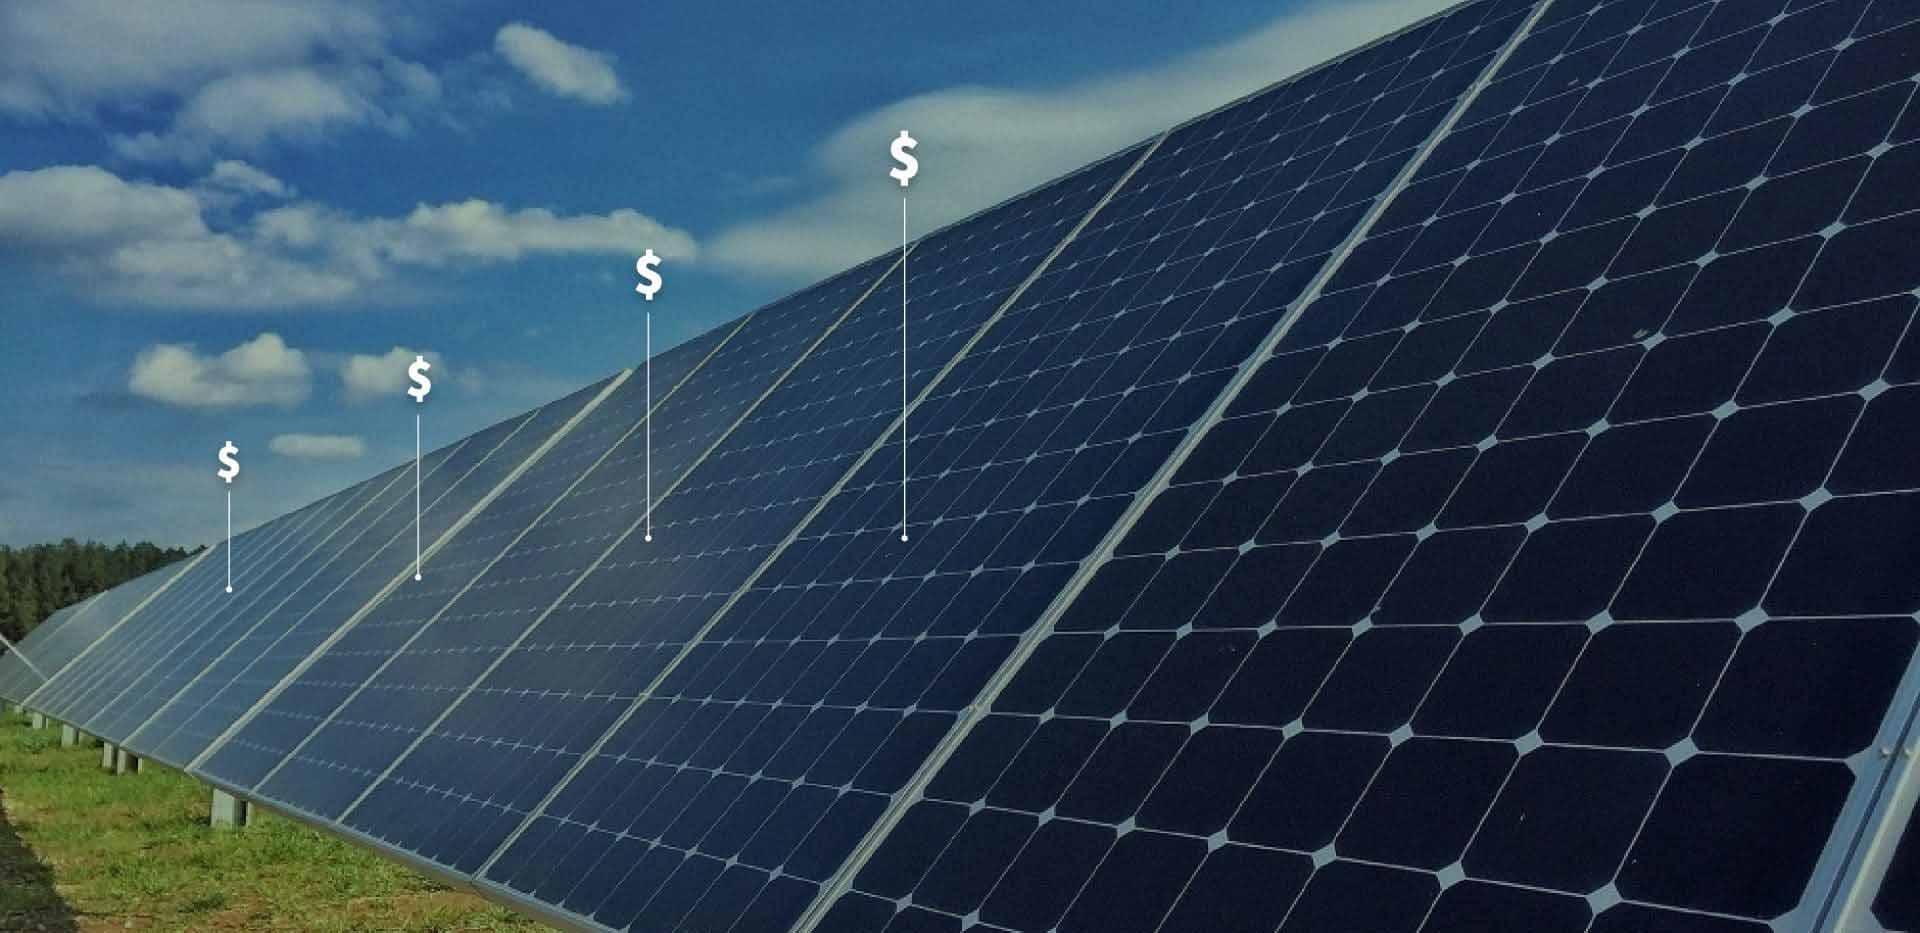 Department of energy solar panels